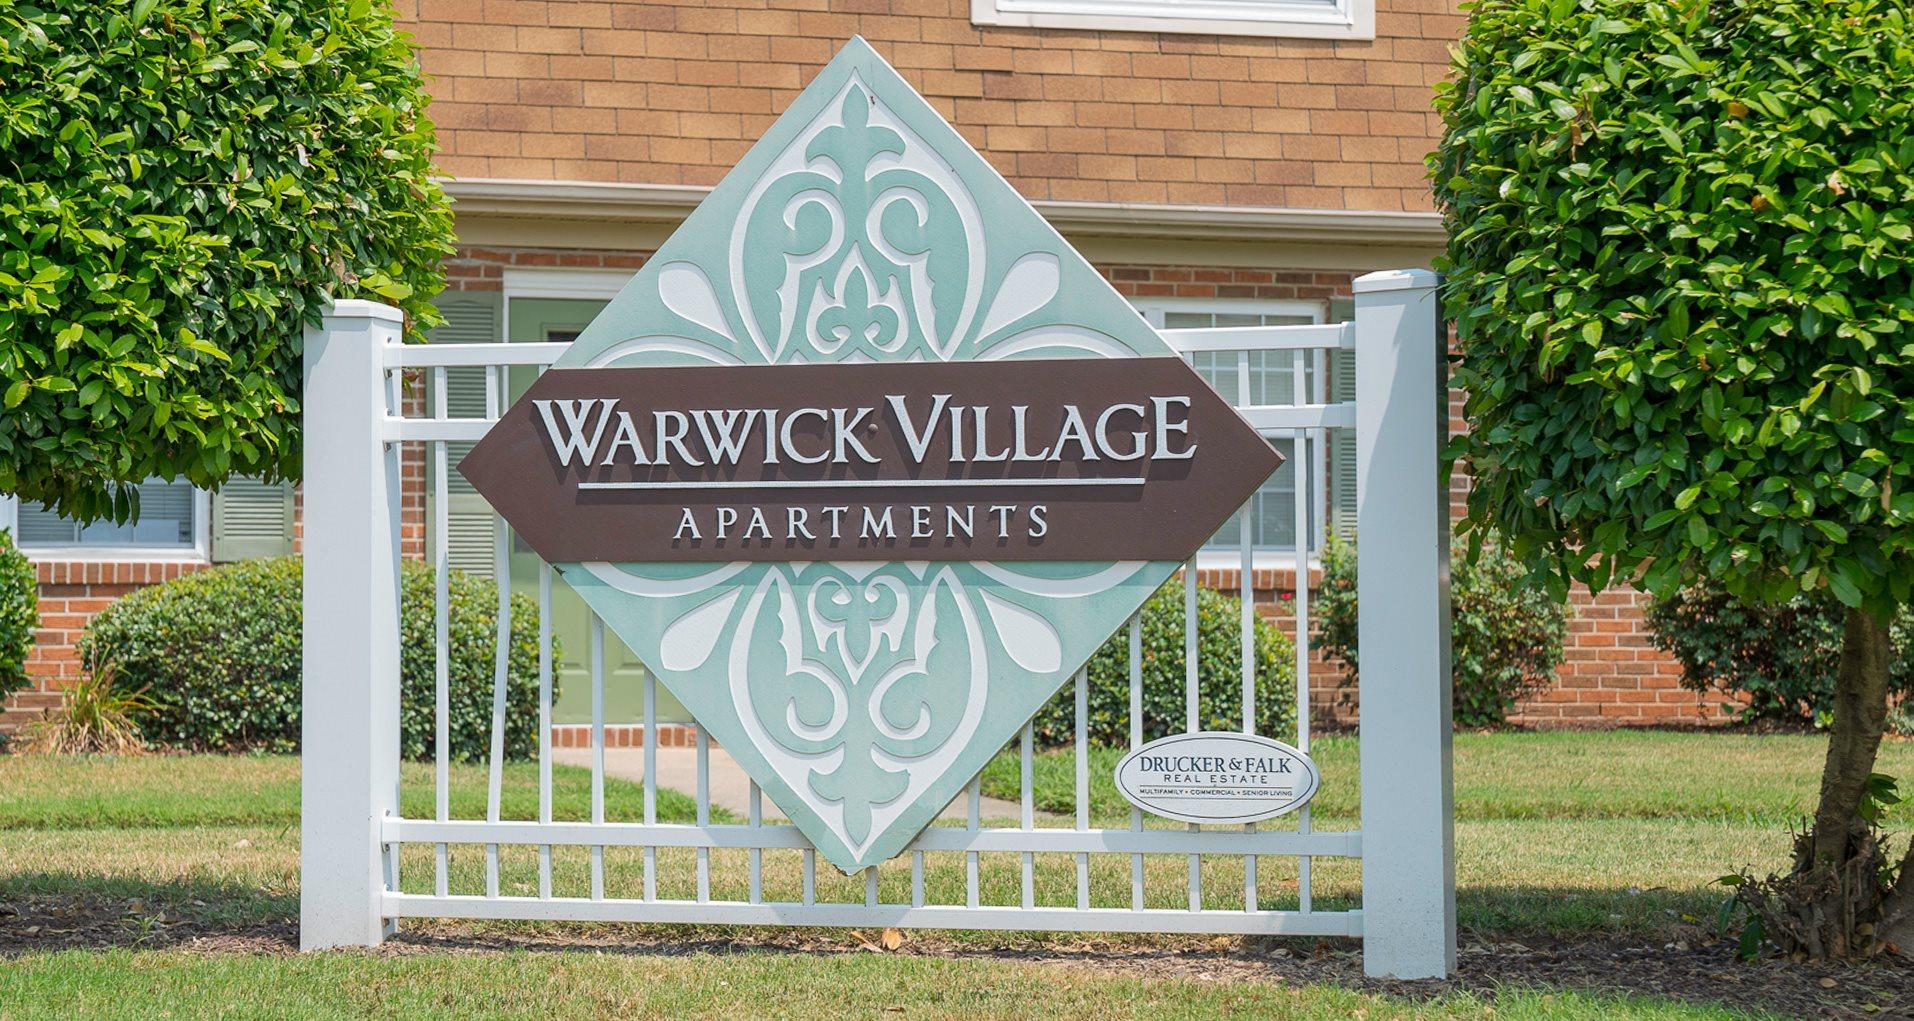 Sign at Warwick Villages Apartments in Newport News VA